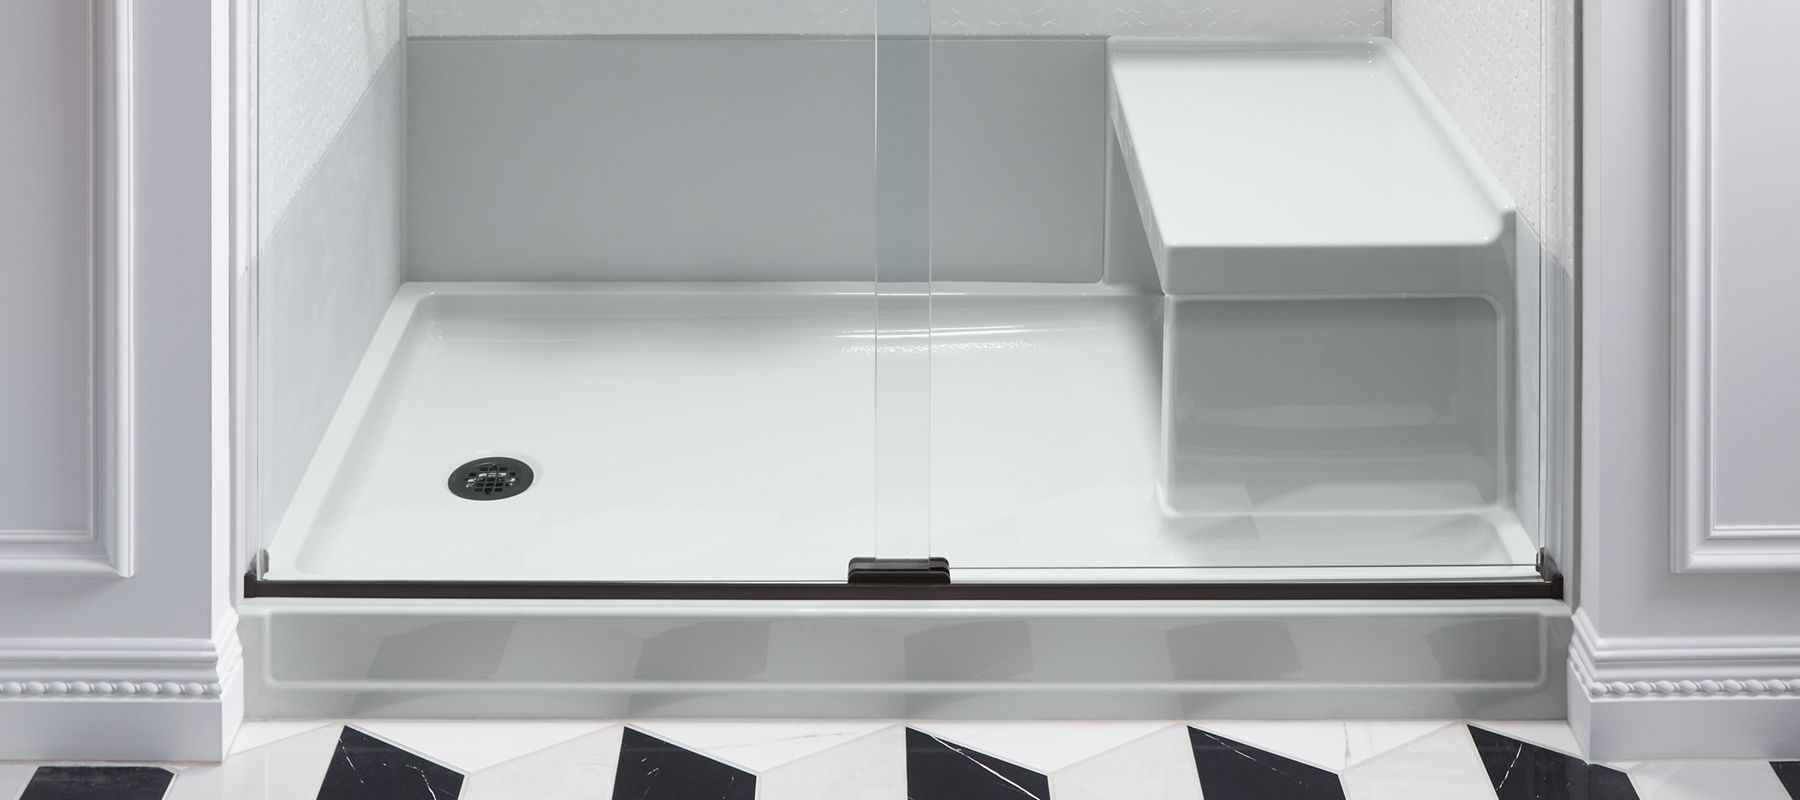 Acrylic Shower Bases | Bathroom | KOHLER